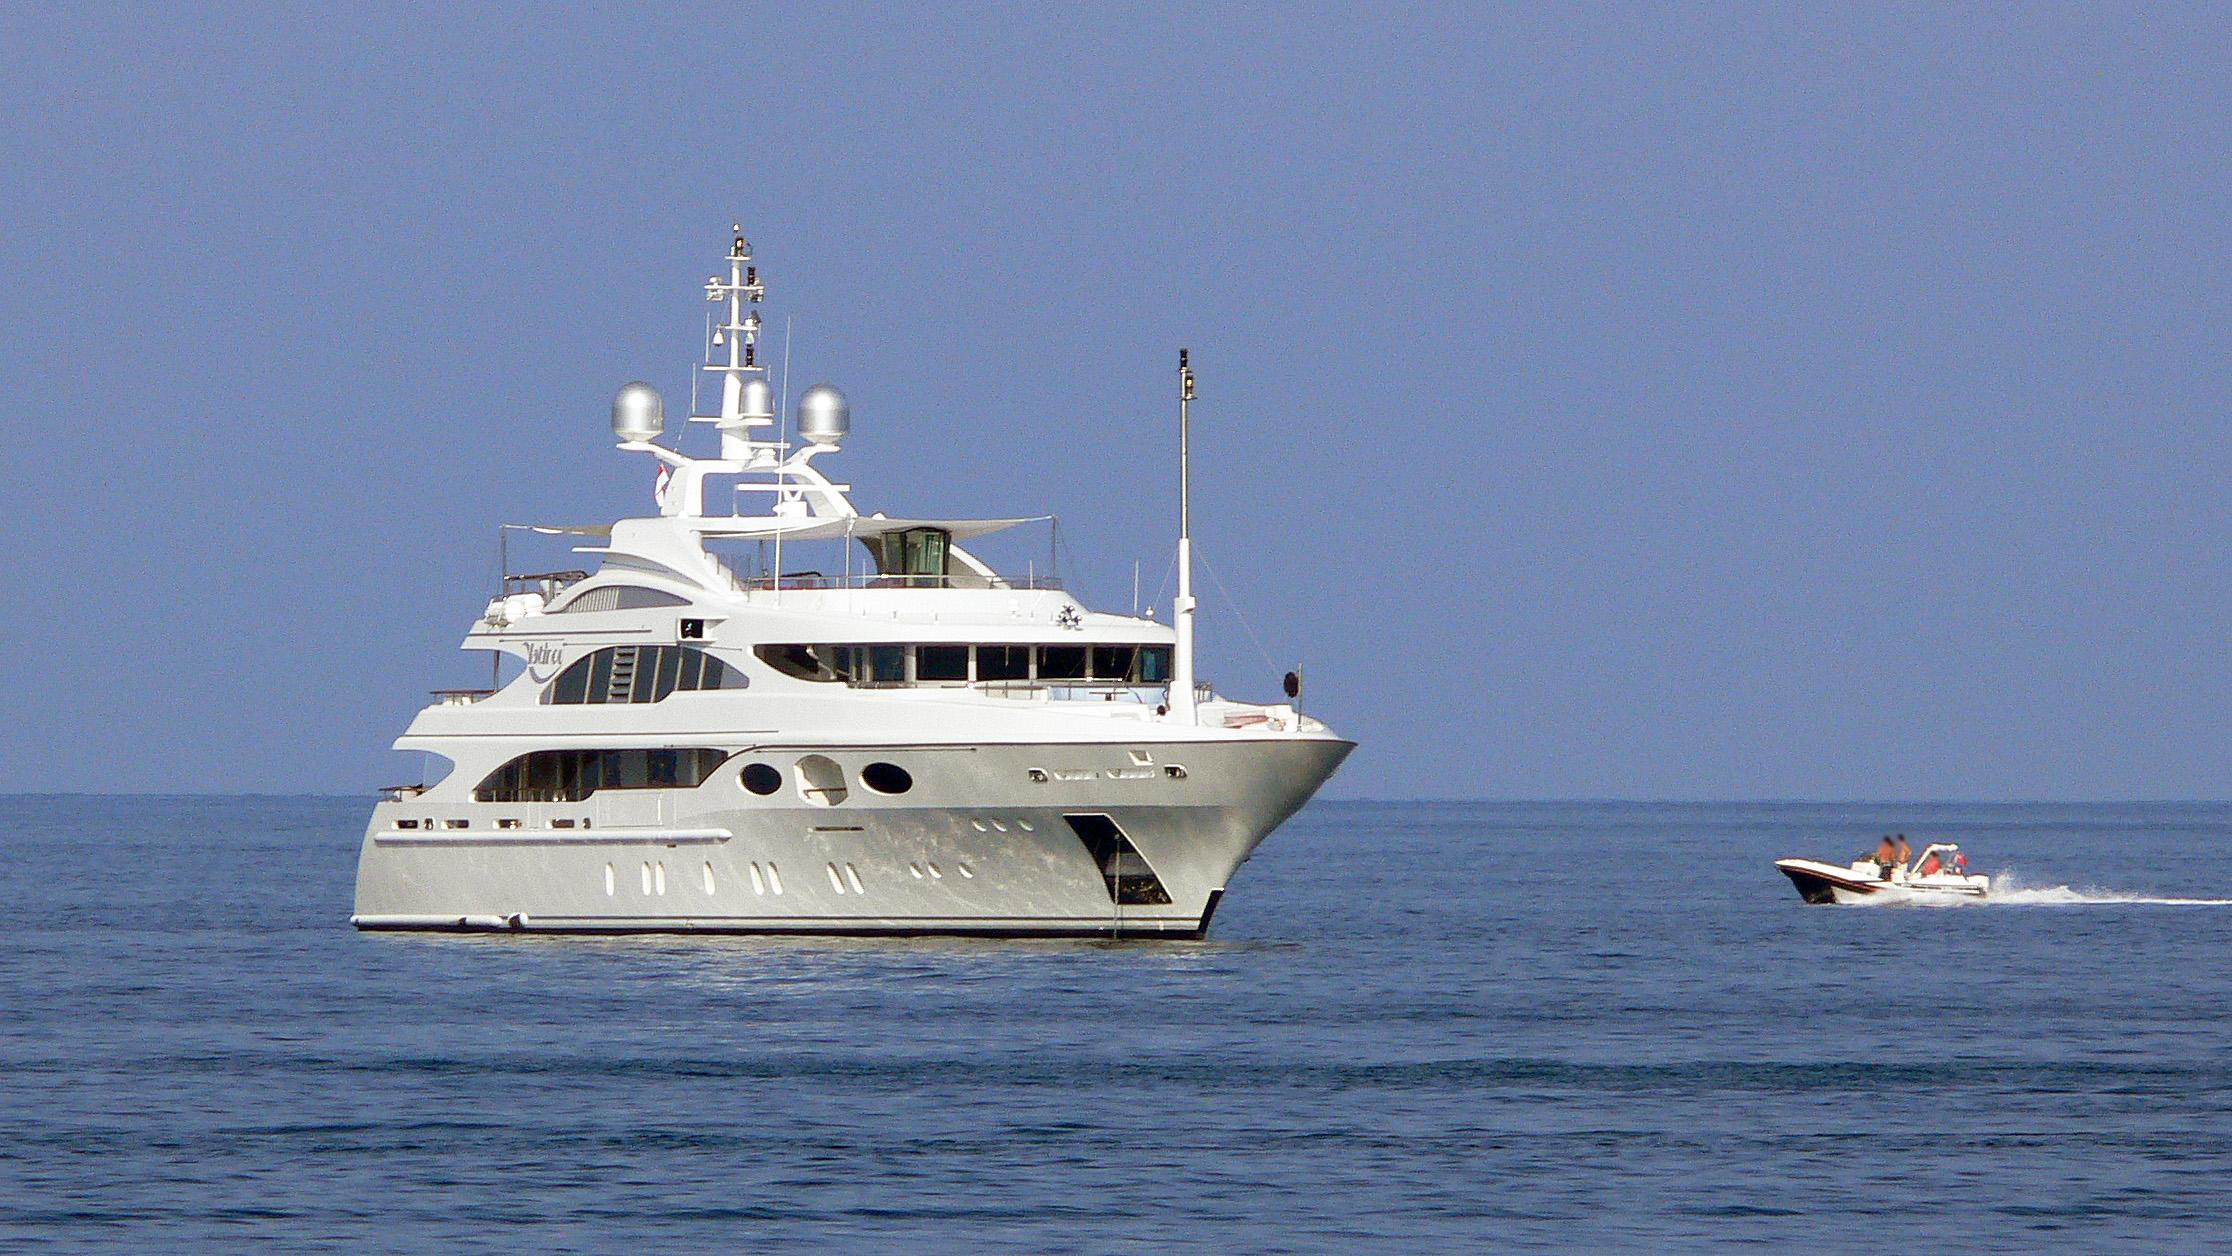 latitude-motor-yacht-benetti-2008-52m-bow